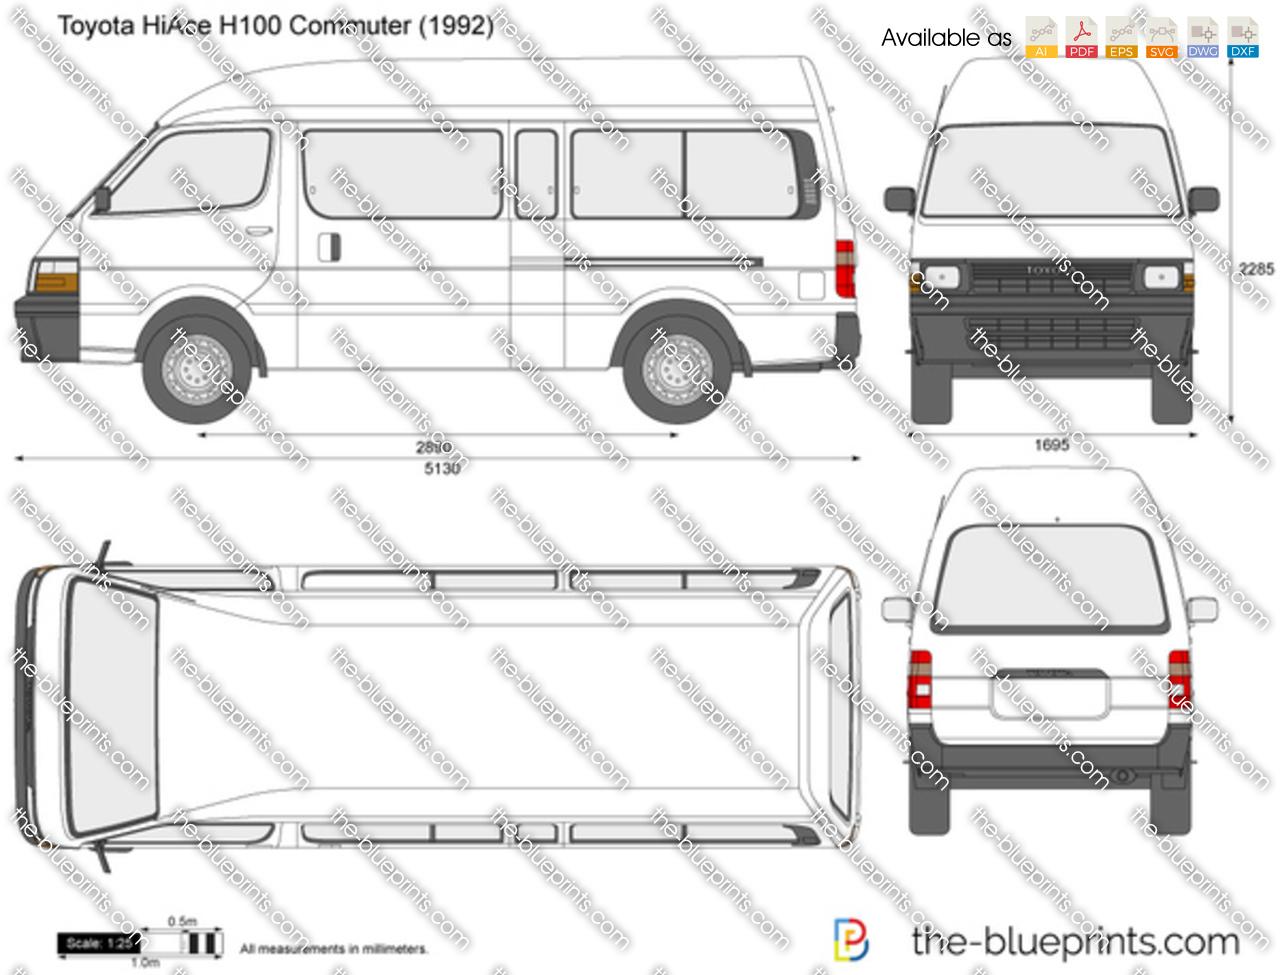 Toyota HiAce H100 Commuter 1994